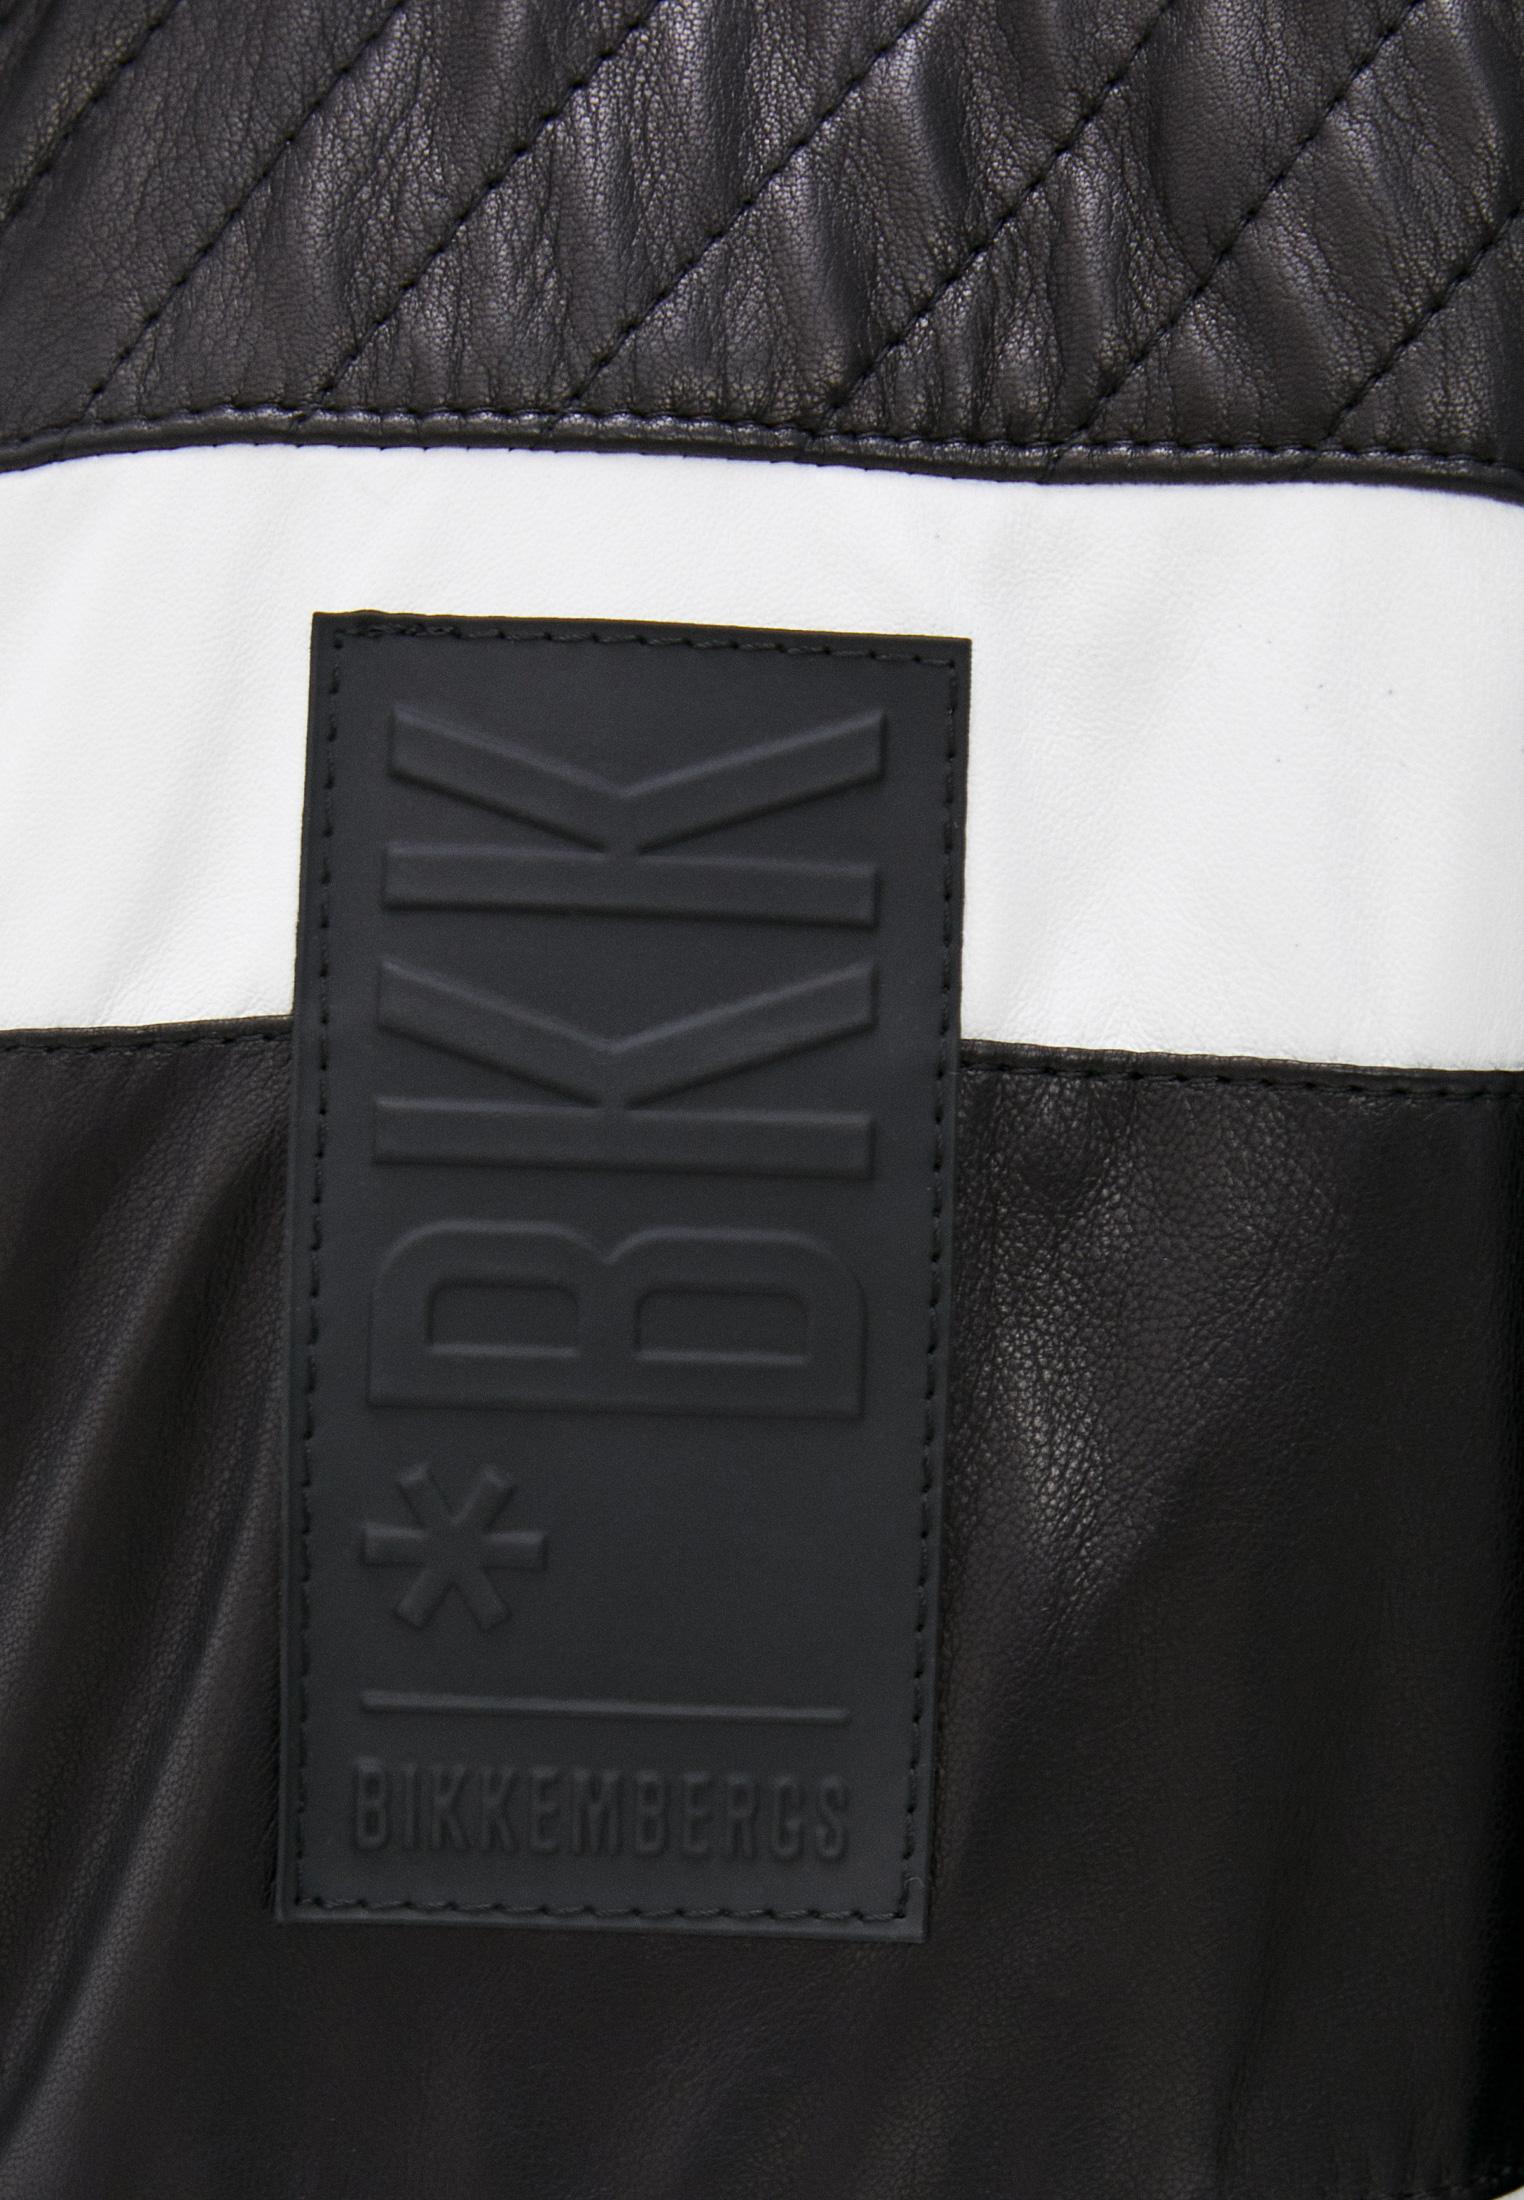 Кожаная куртка Bikkembergs (Биккембергс) C H 117 80 D 1180: изображение 6